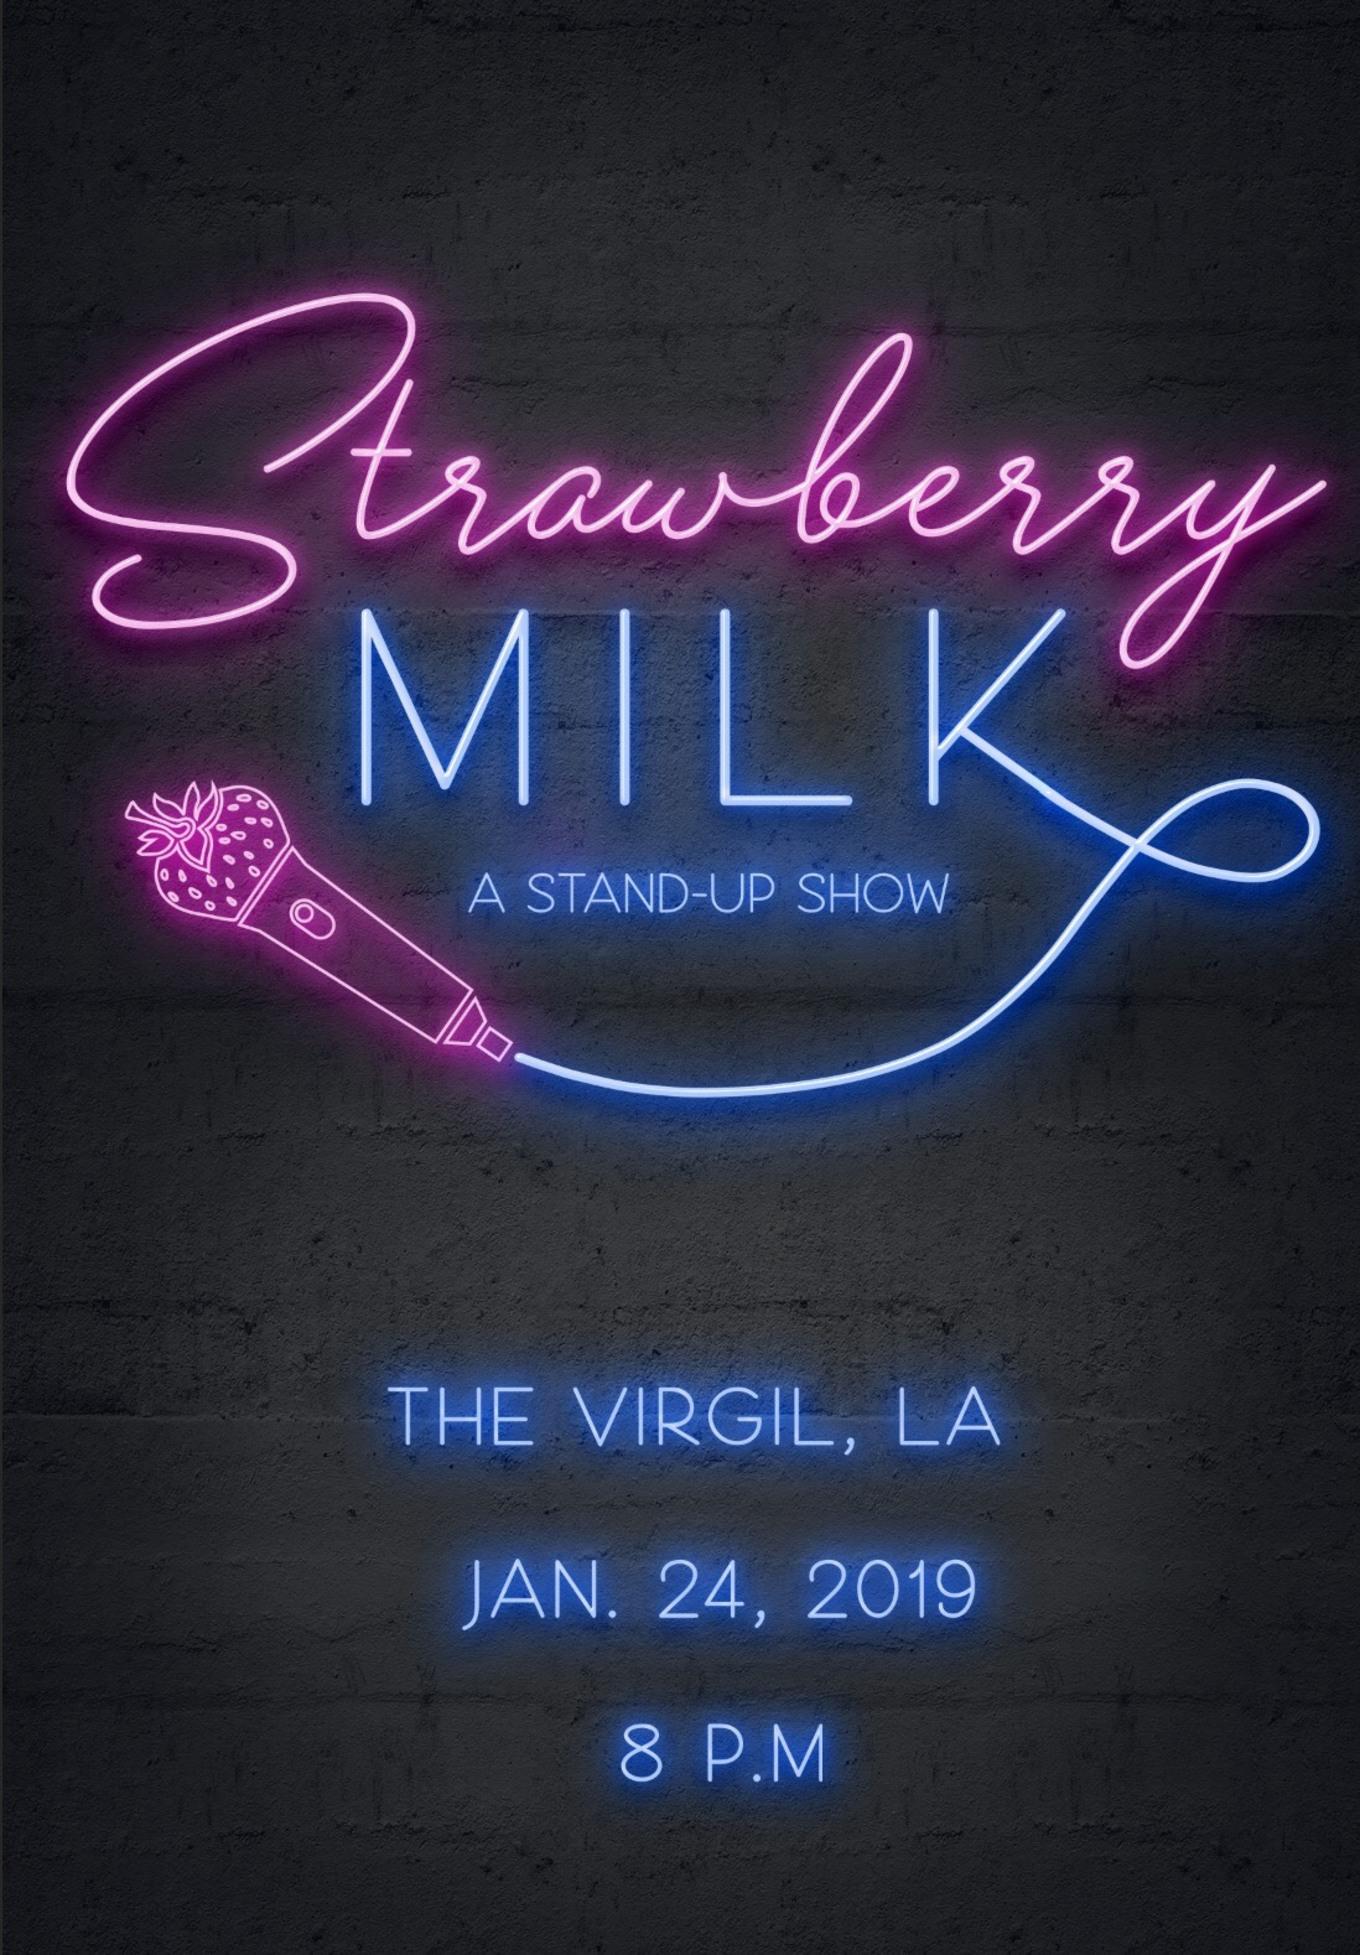 Strawberry Milk - Tickets - The Virgil, Los Angeles, CA